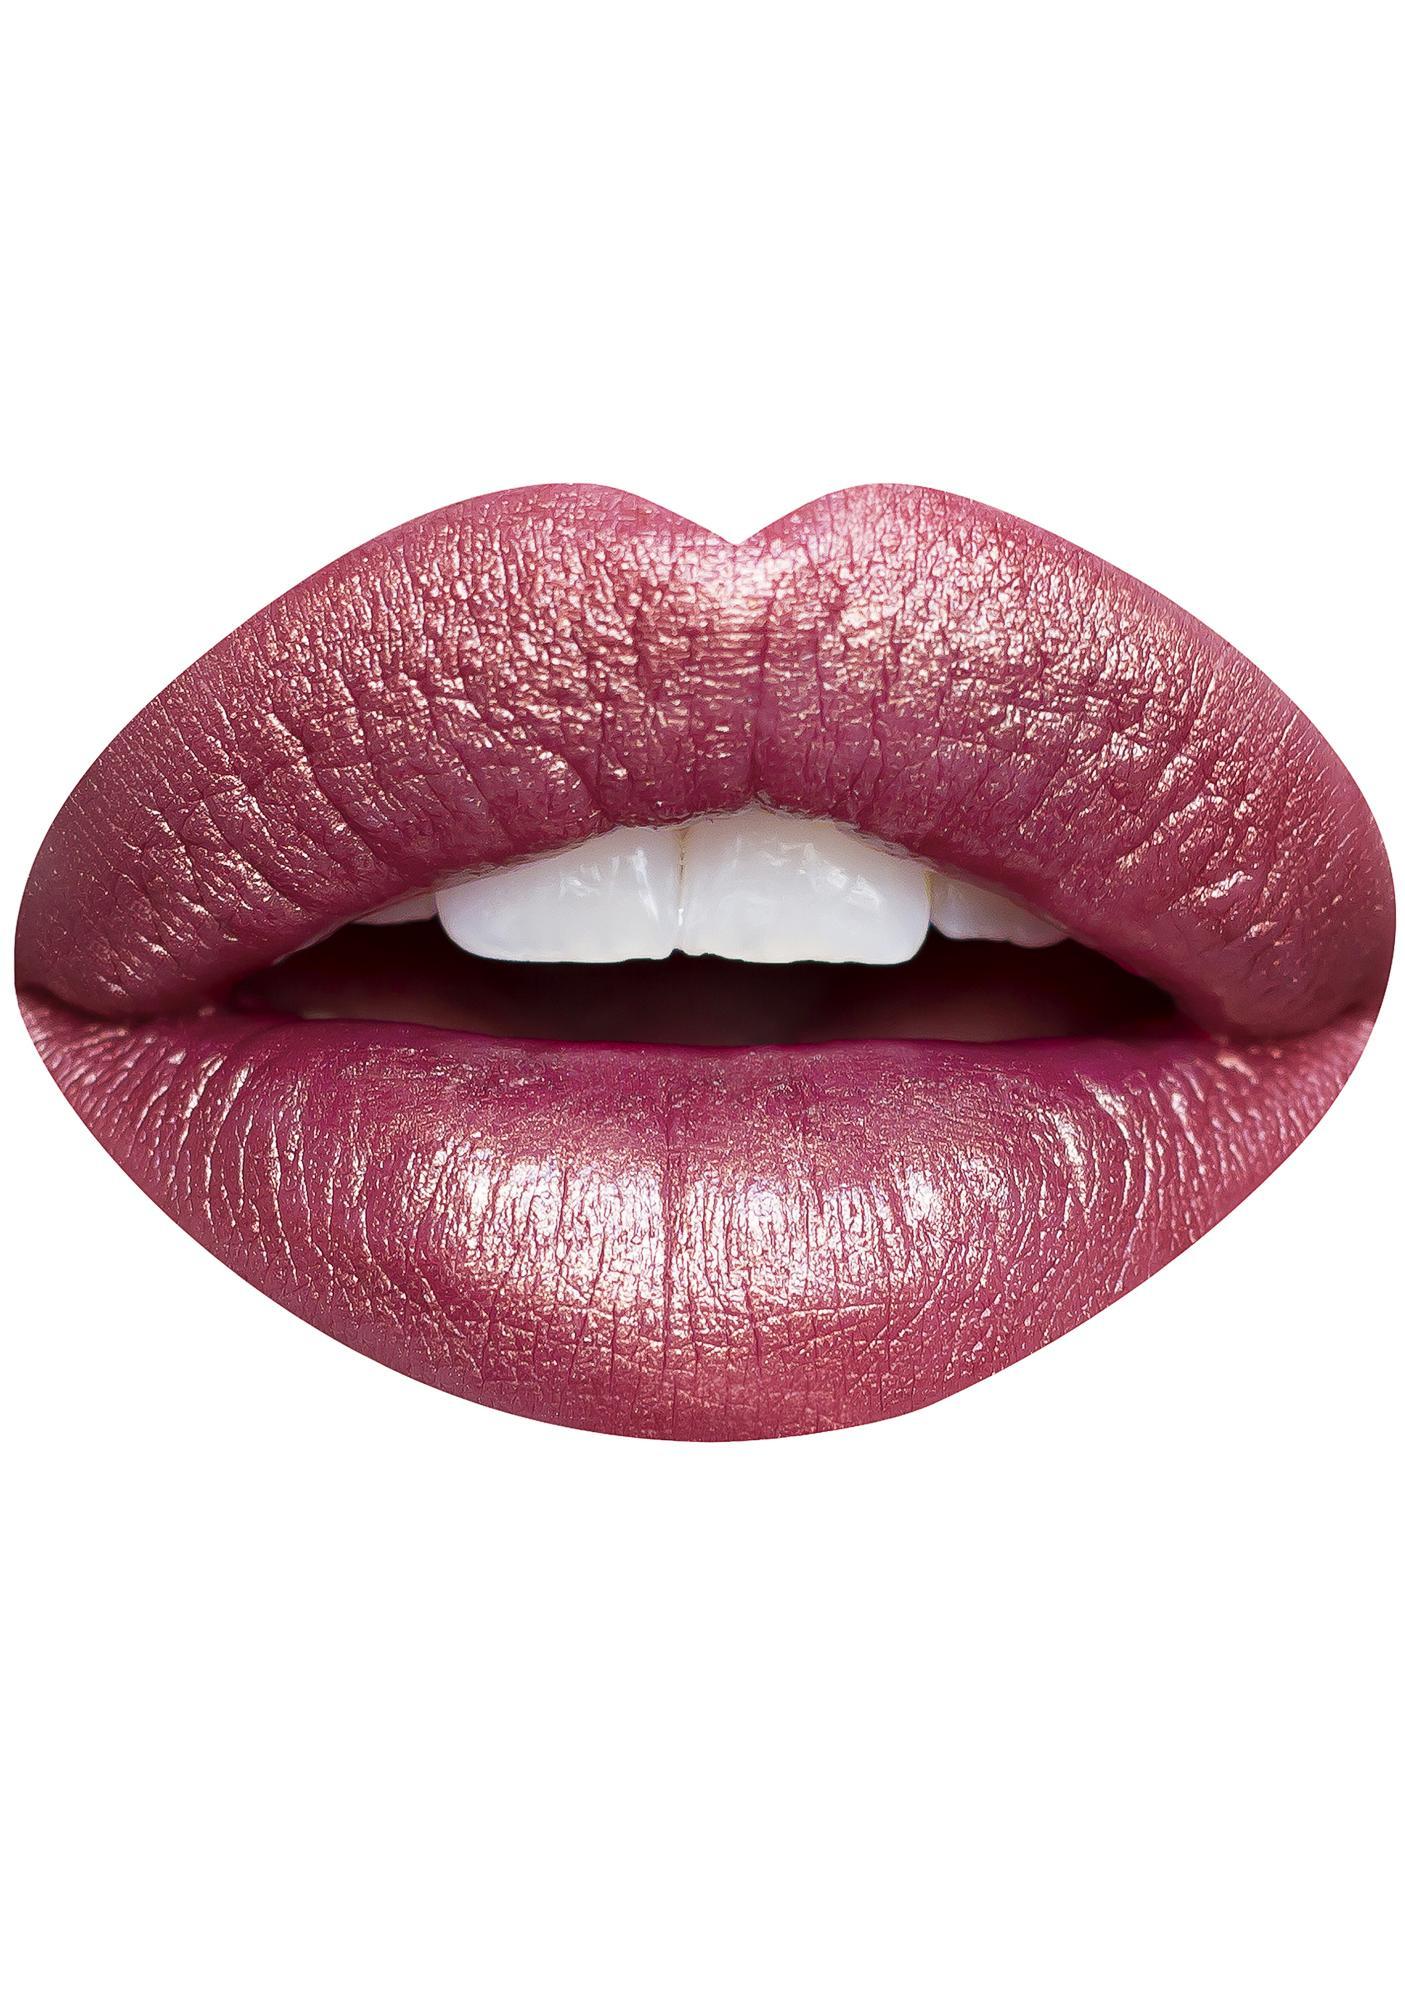 NEVERMIND Cosmetics Hair Flip Lipstick